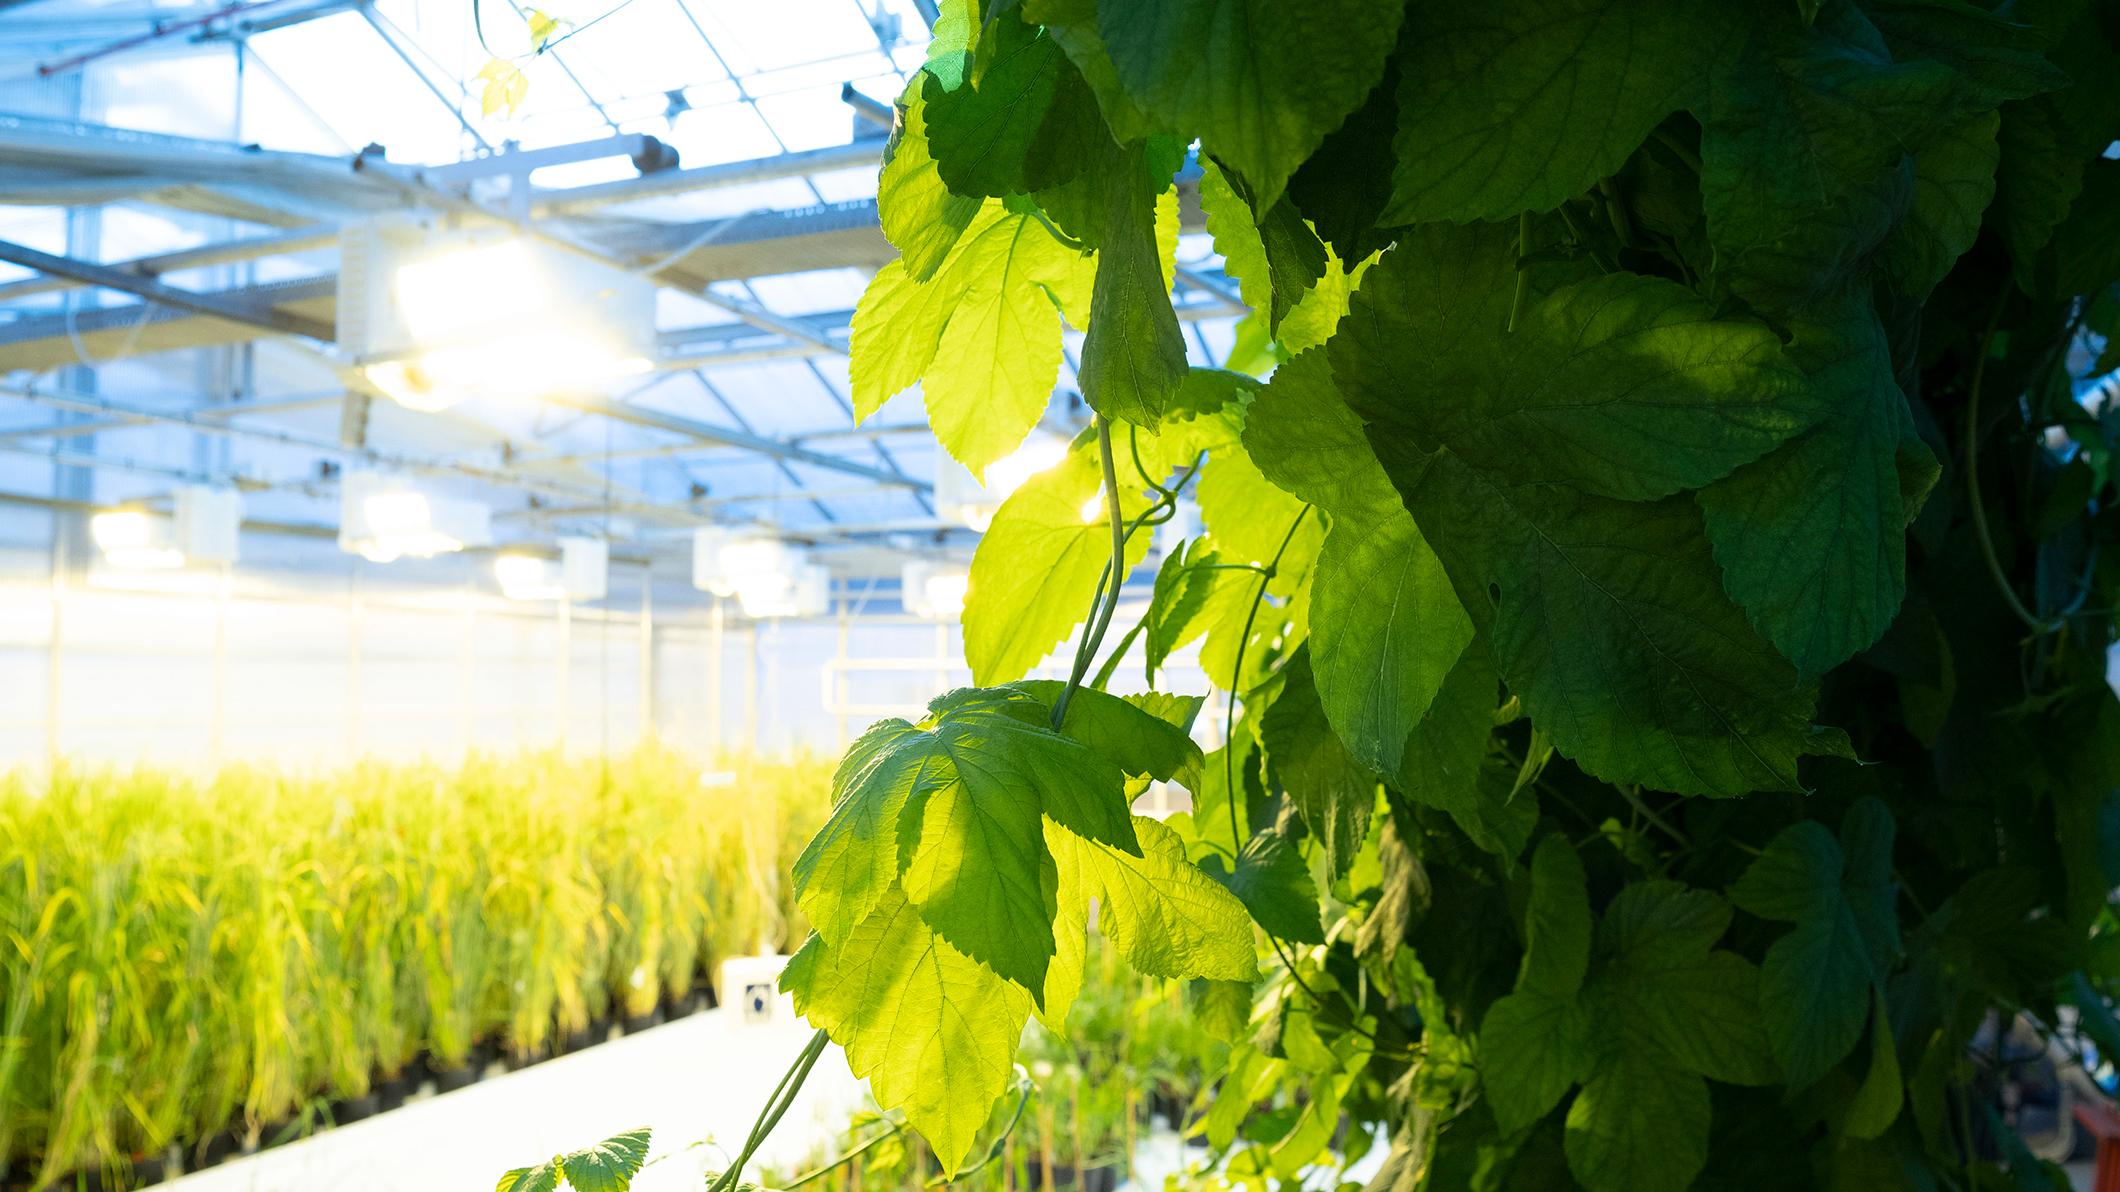 Carlsberg Brewery's greenhouse laboratory.